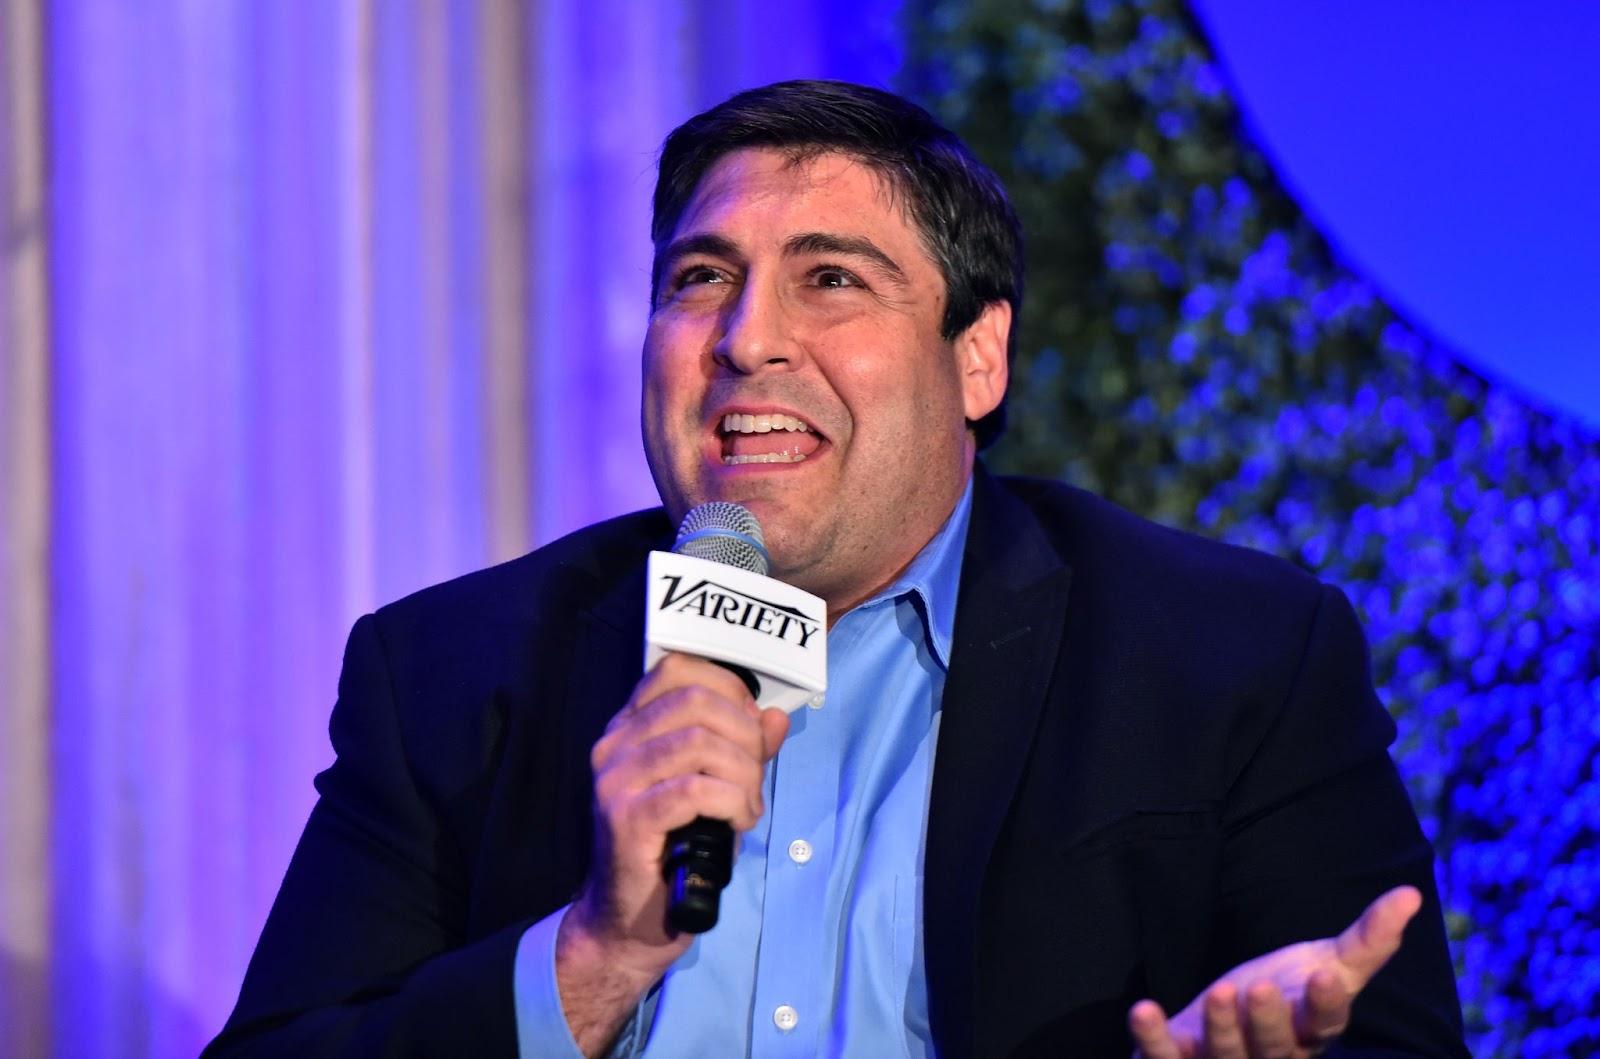 Adam Goldberg Net Worth And Early Life